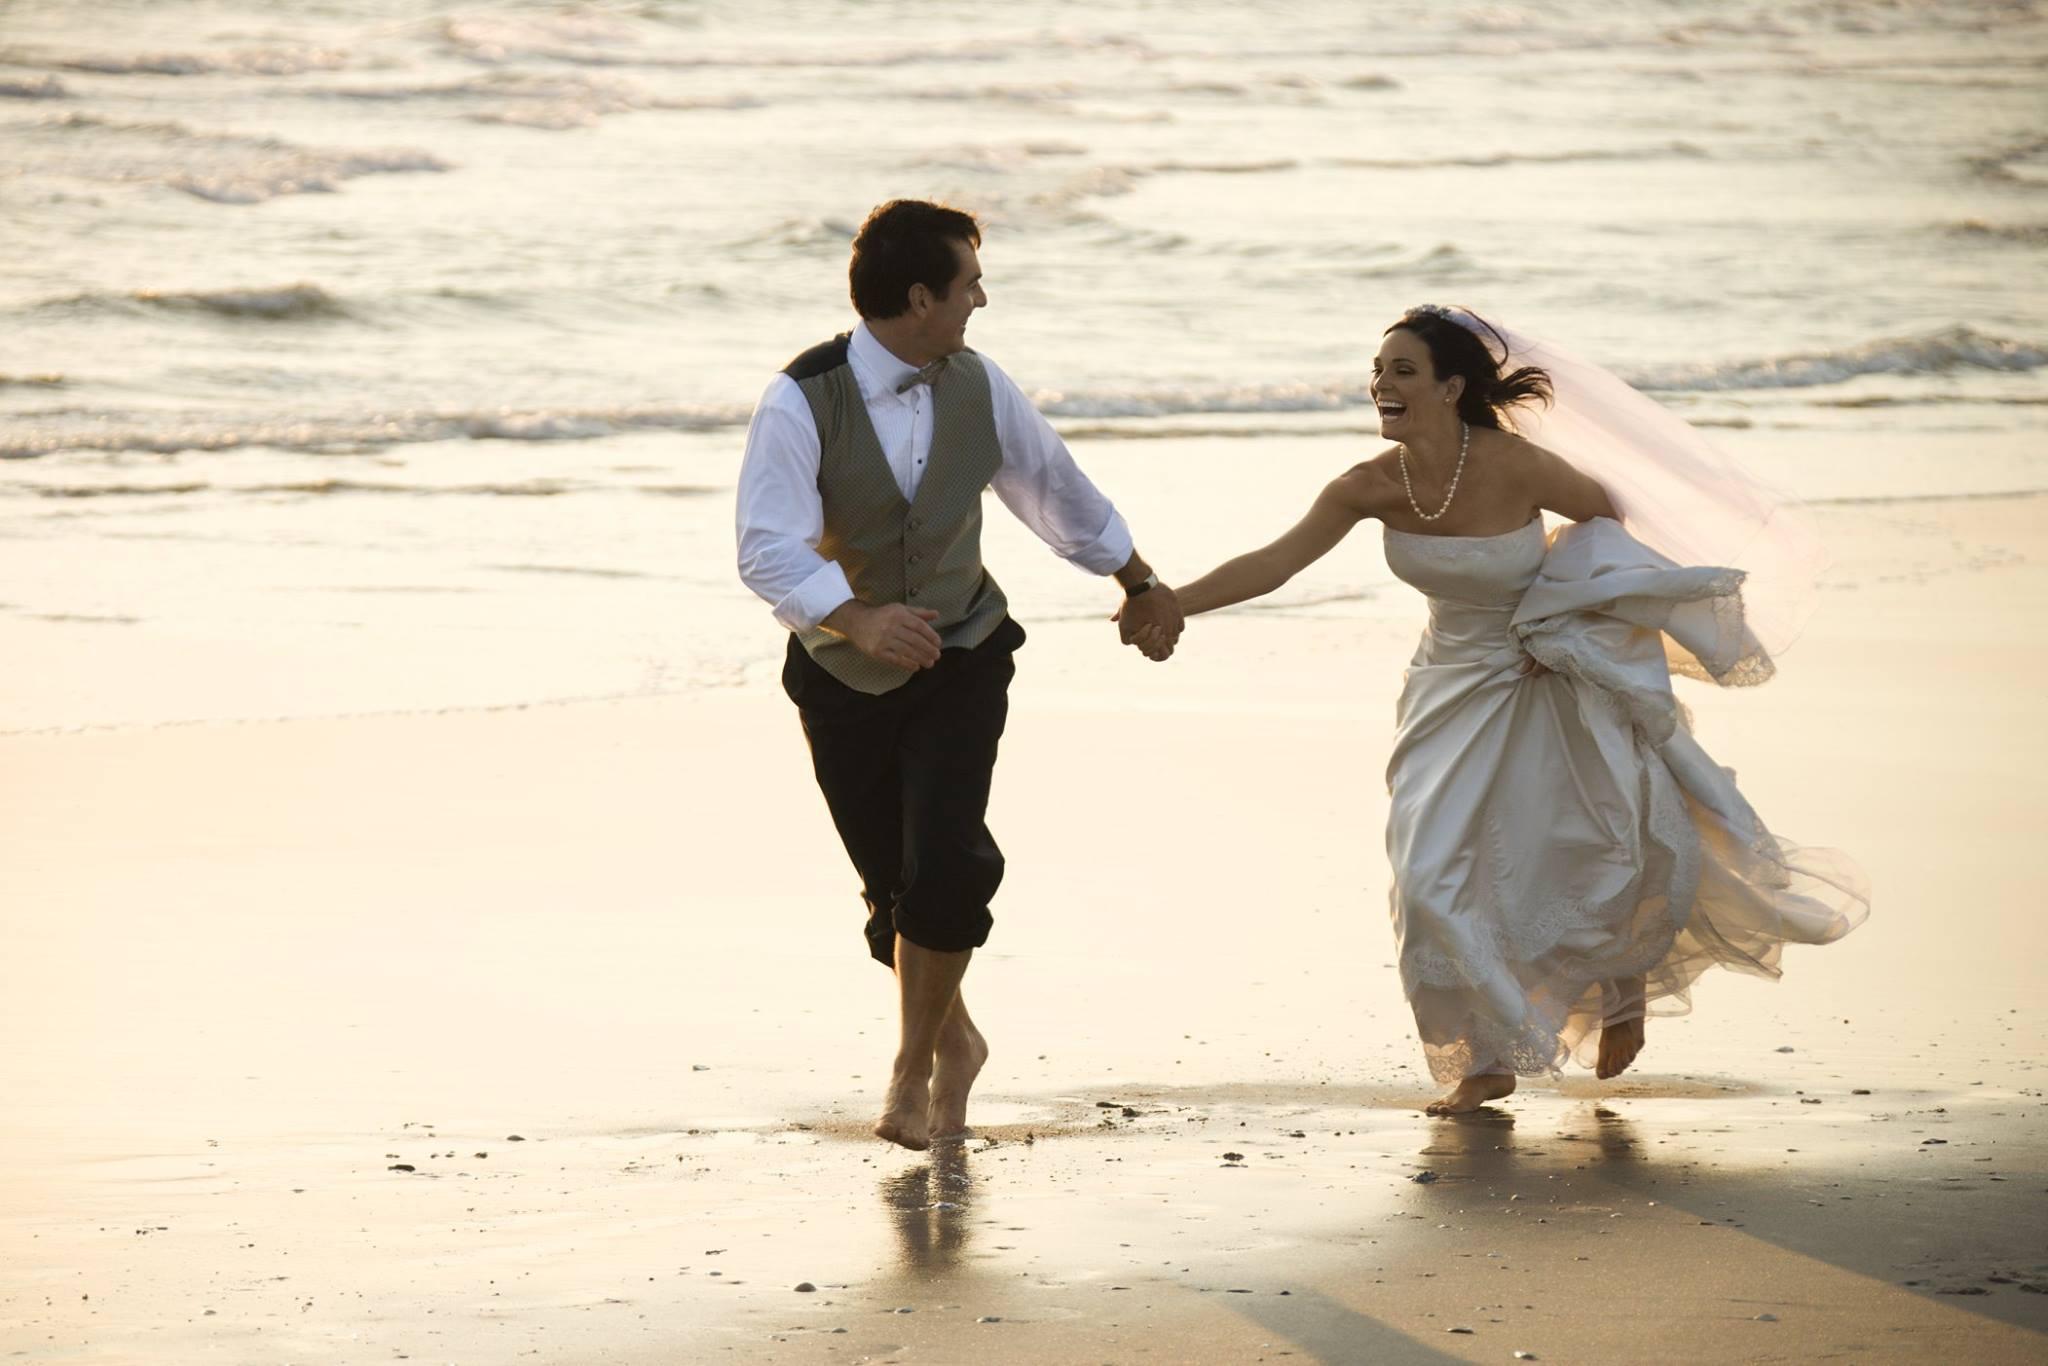 صور عريس وعروسه يوم الزفاف 9 صور عريس وعروسه يوم الزفاف